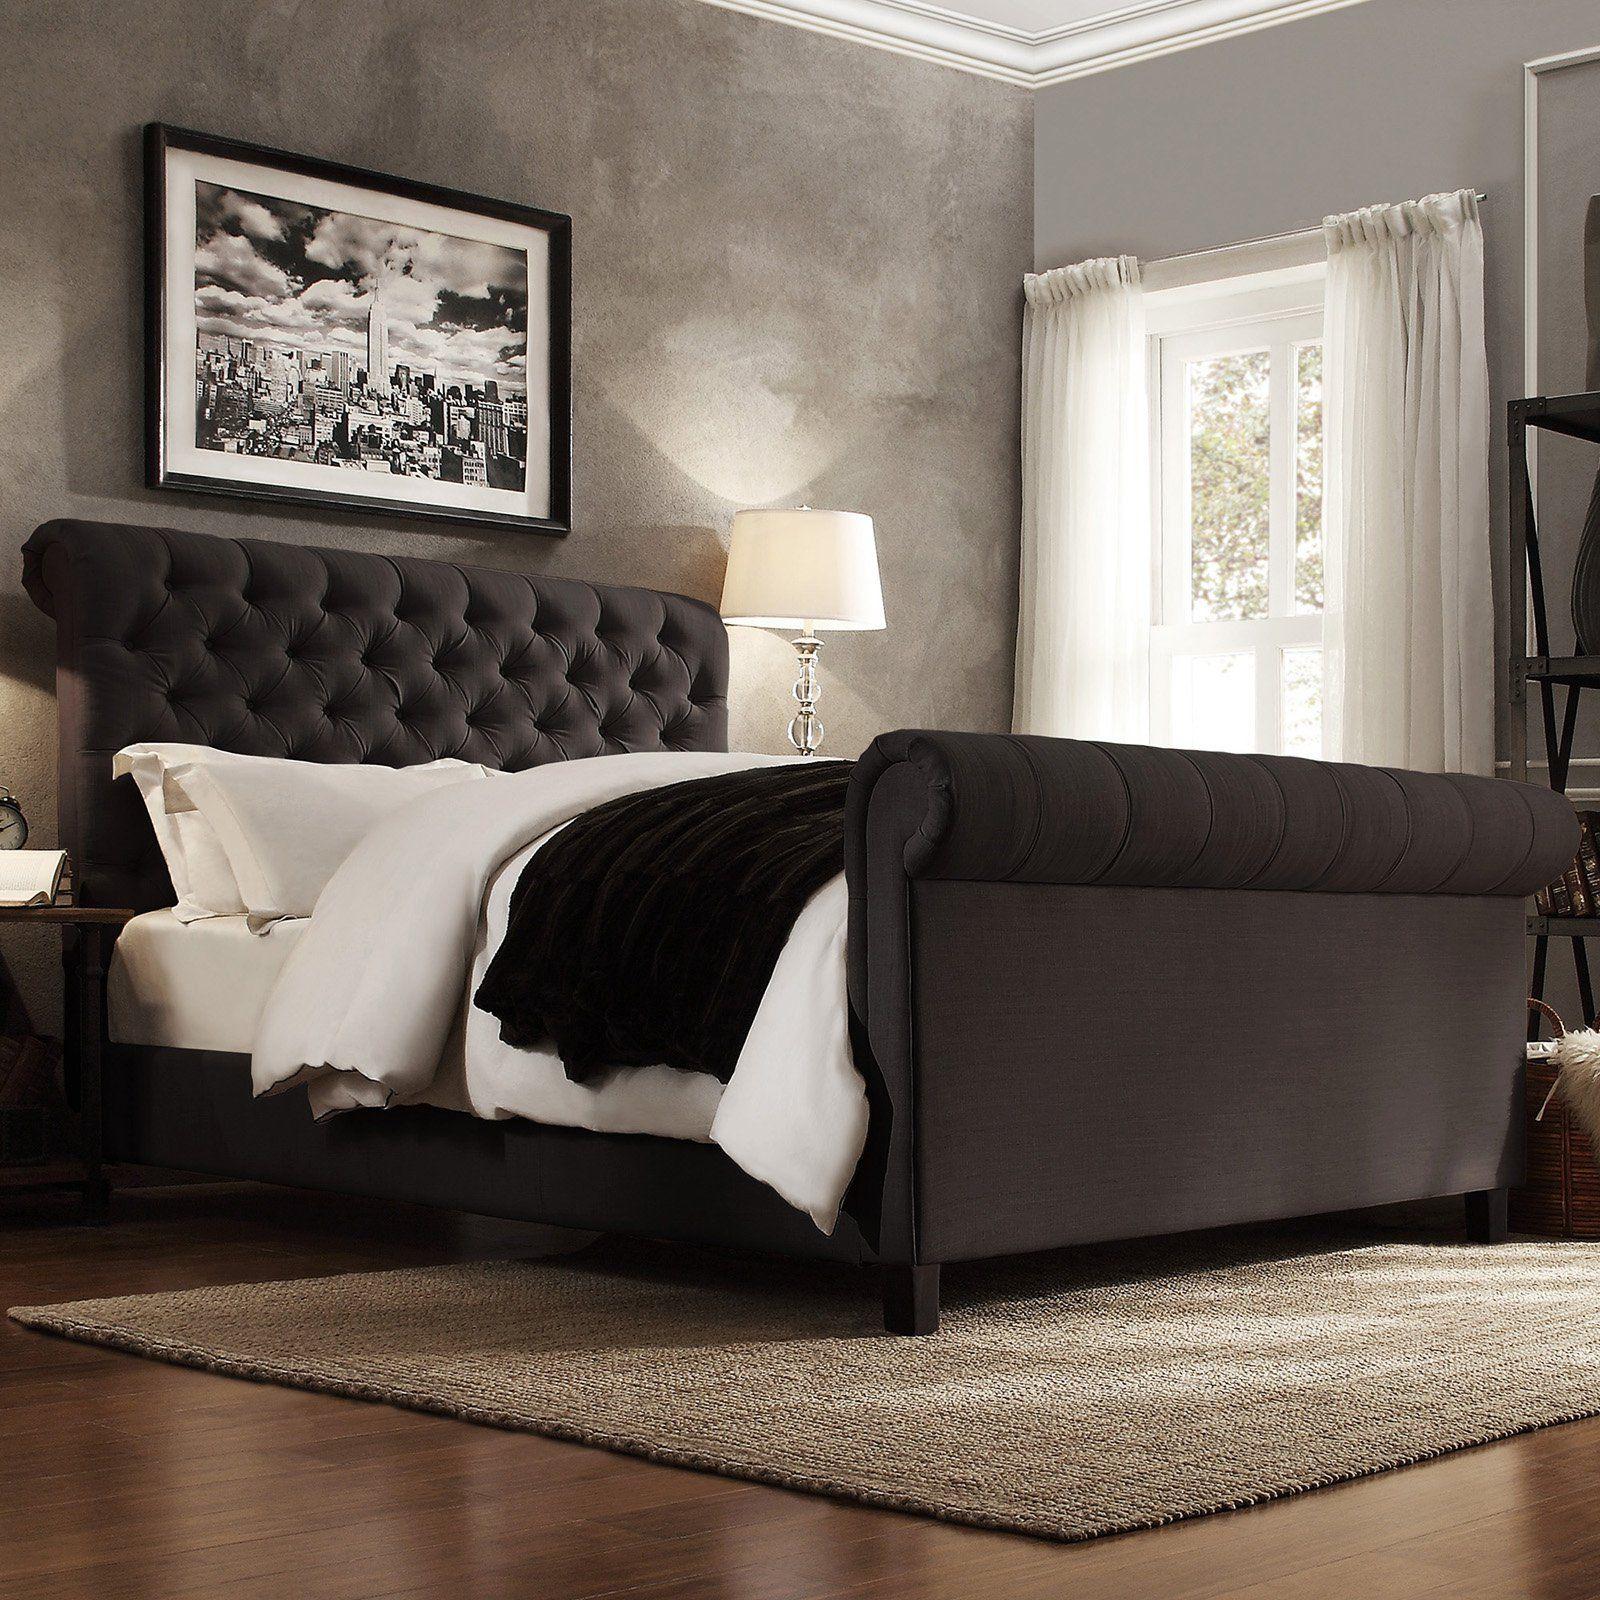 Weston Home Ellesmere Tufted Upholstered Sleigh Bed Upholstered